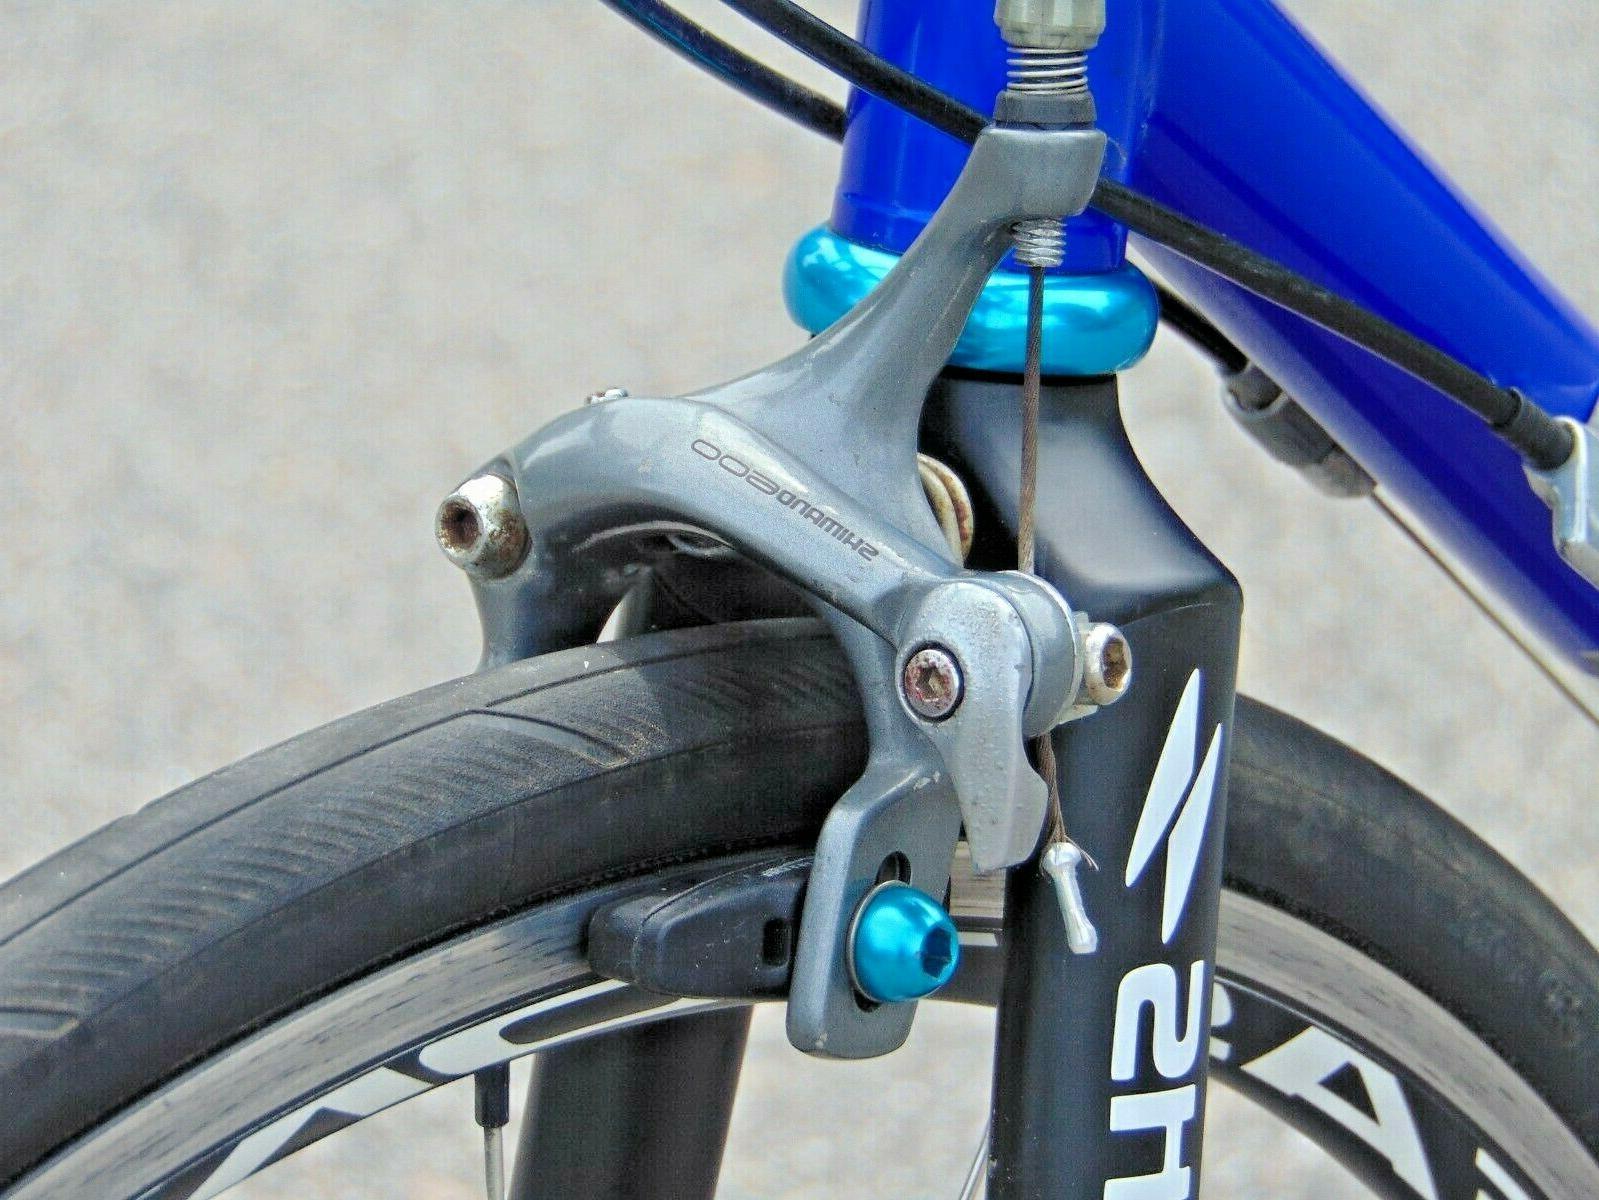 Schwinn Light Road Bike Extra Large